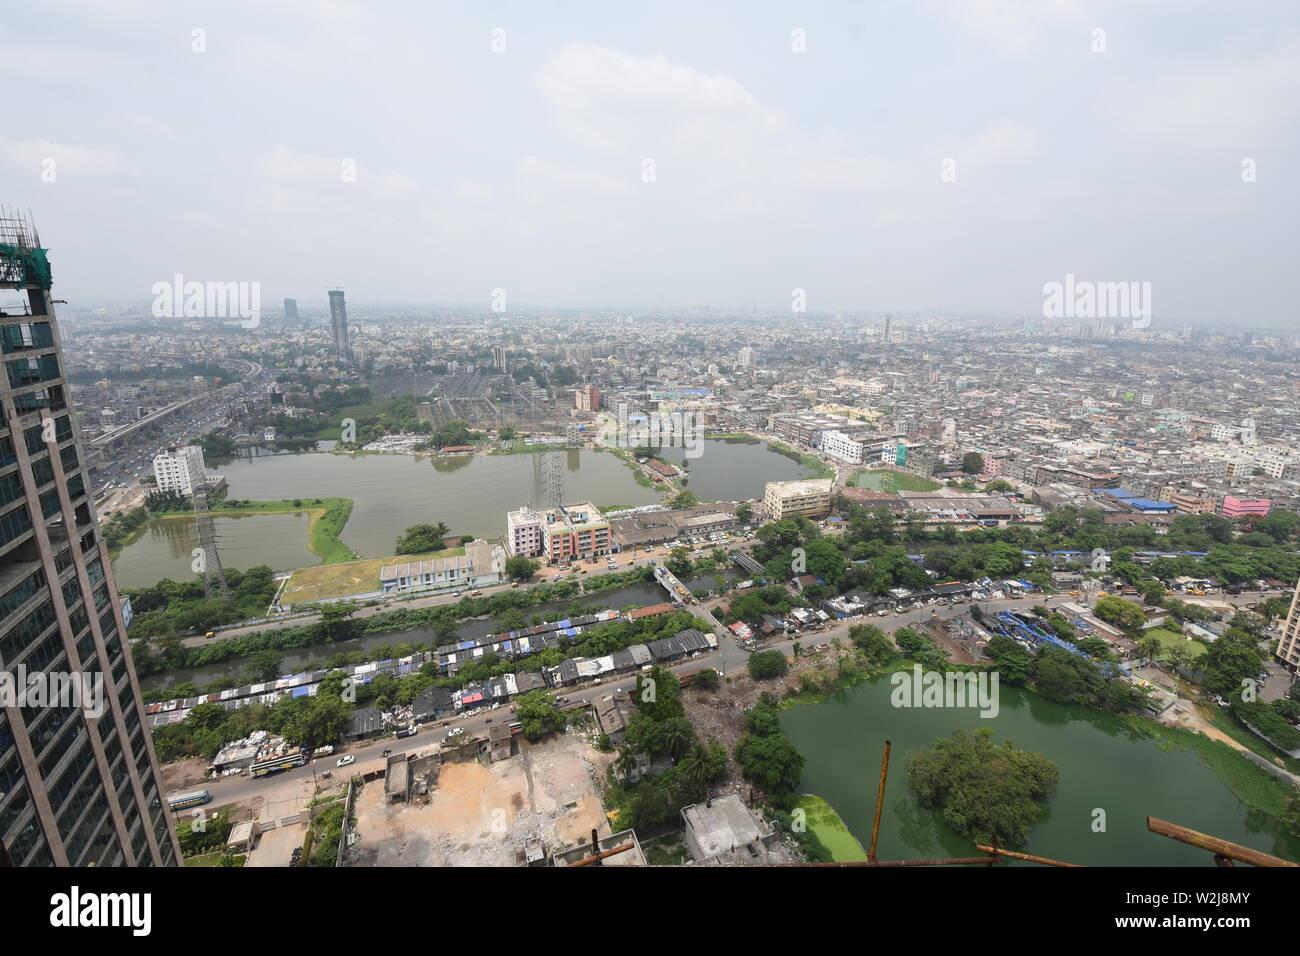 Elevated view of Topsia area, Kolkata, India. - Stock Image